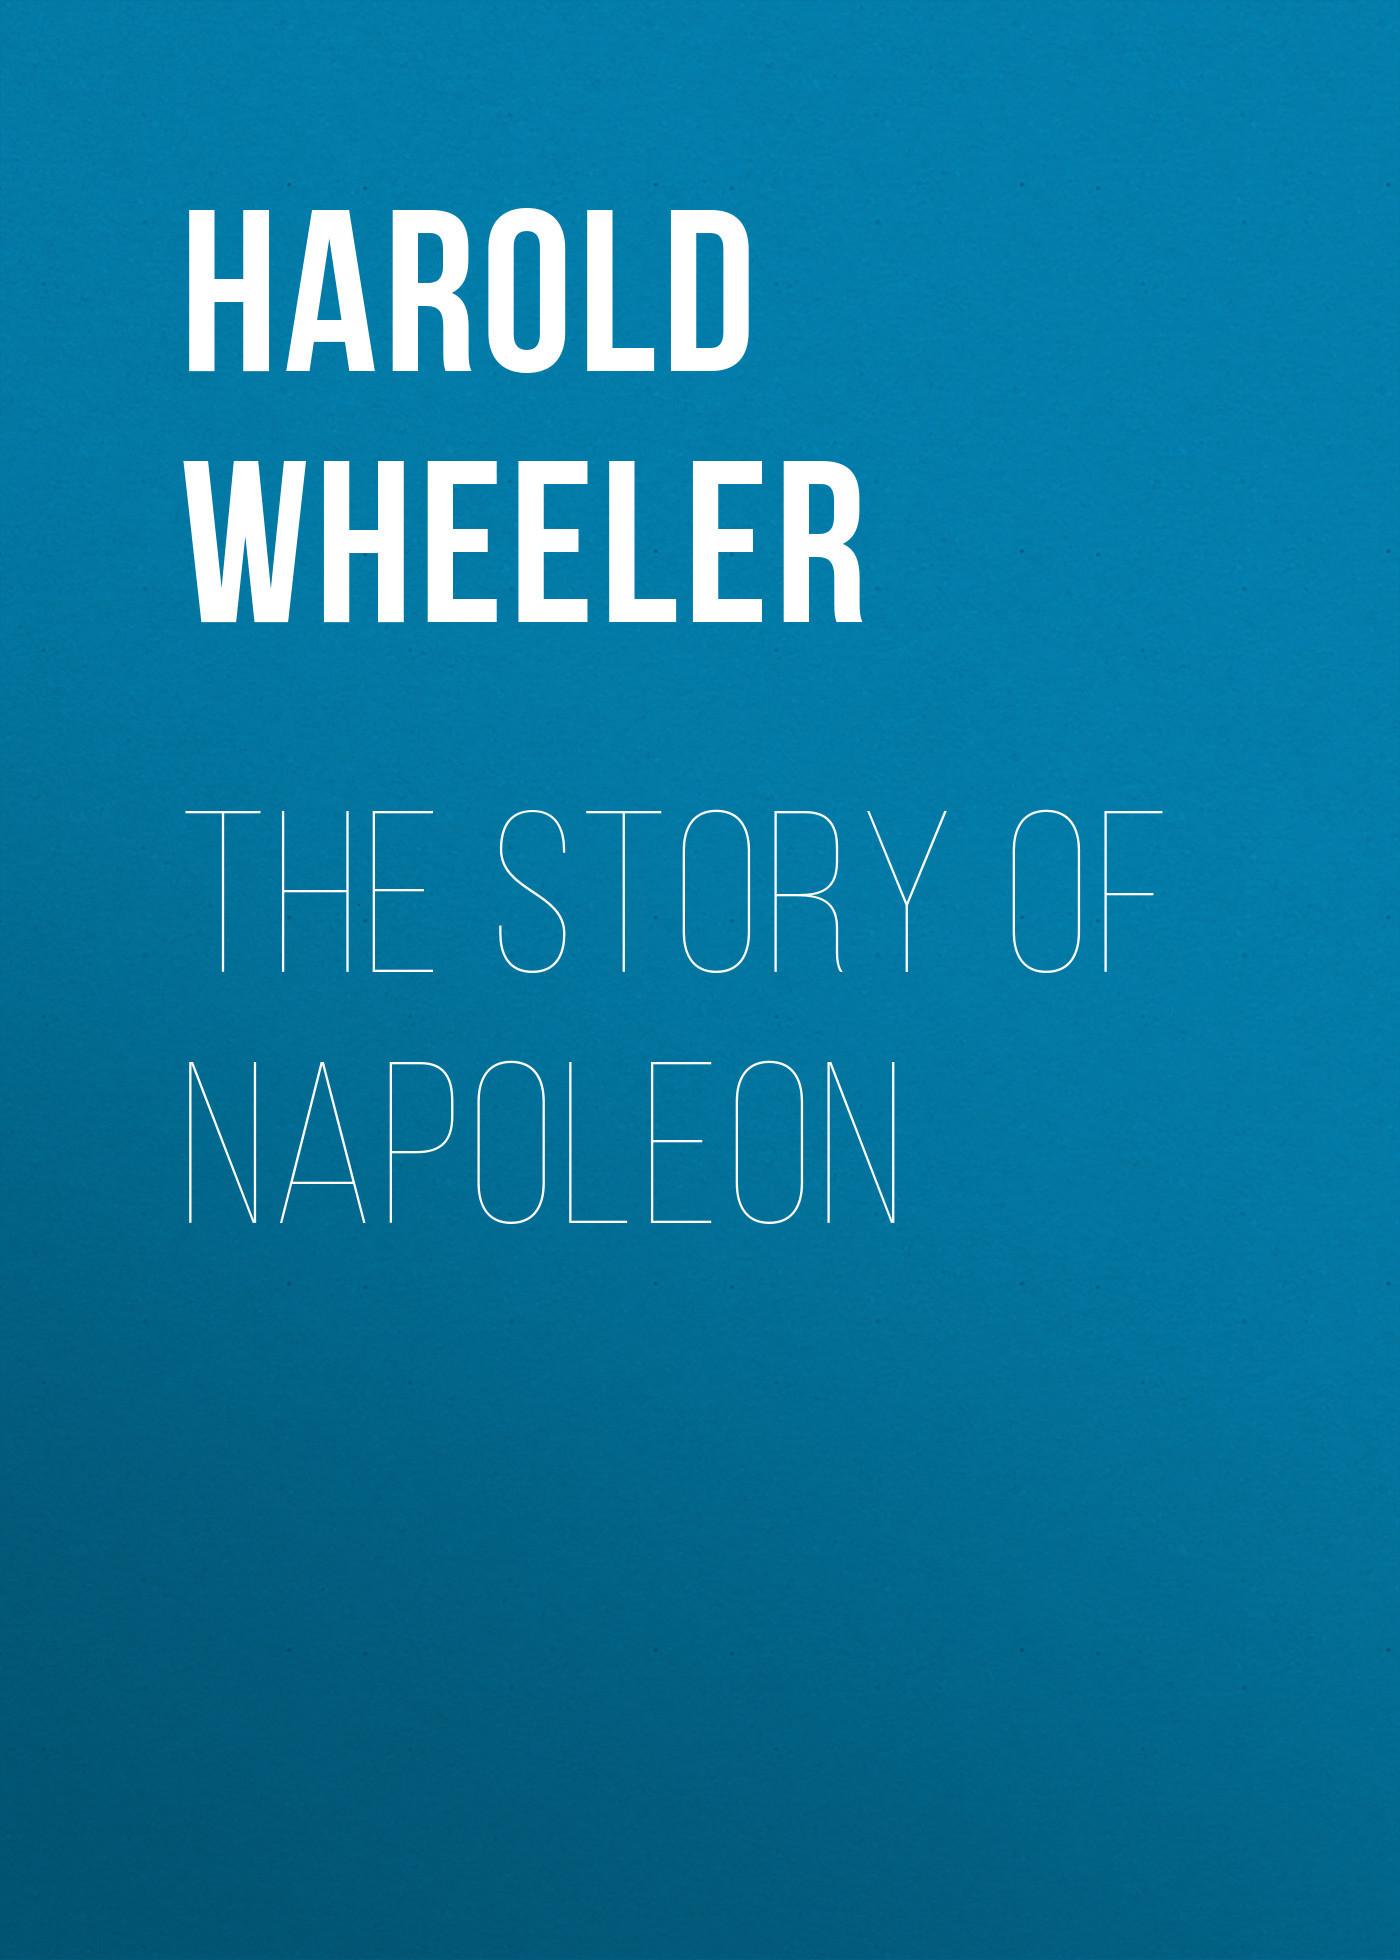 Harold Wheeler The Story of Napoleon goodwin harold leland the wailing octopus a rick brant science adventure story